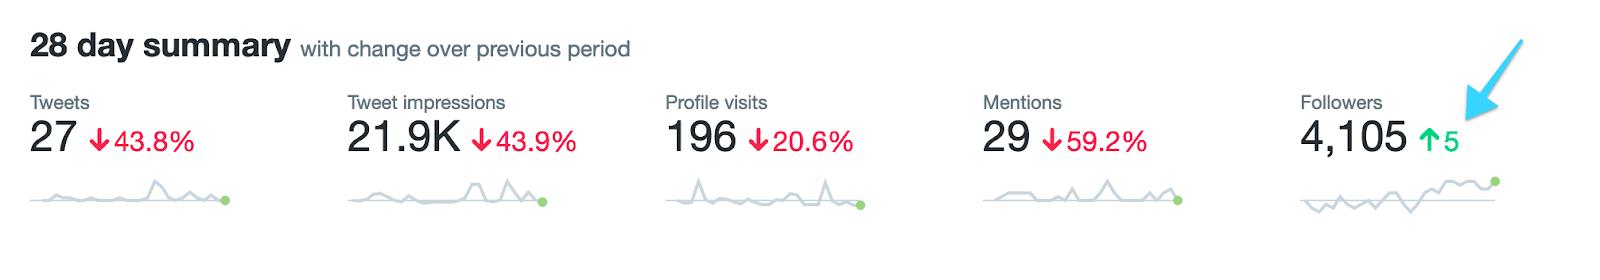 Tweets 28 day summary analytics